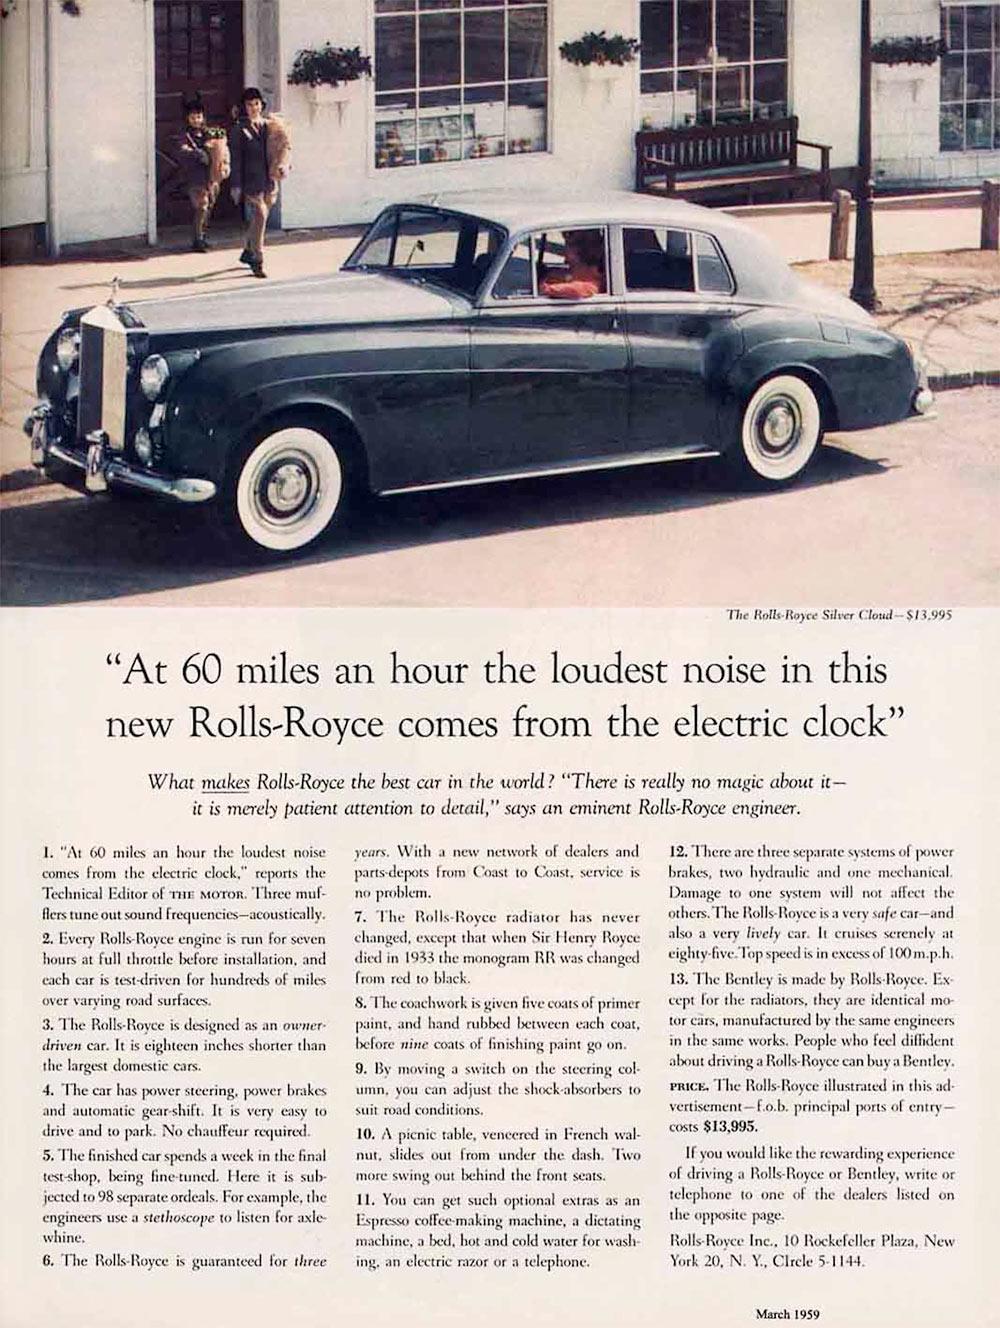 David Ogilvy Rolls Royce ad